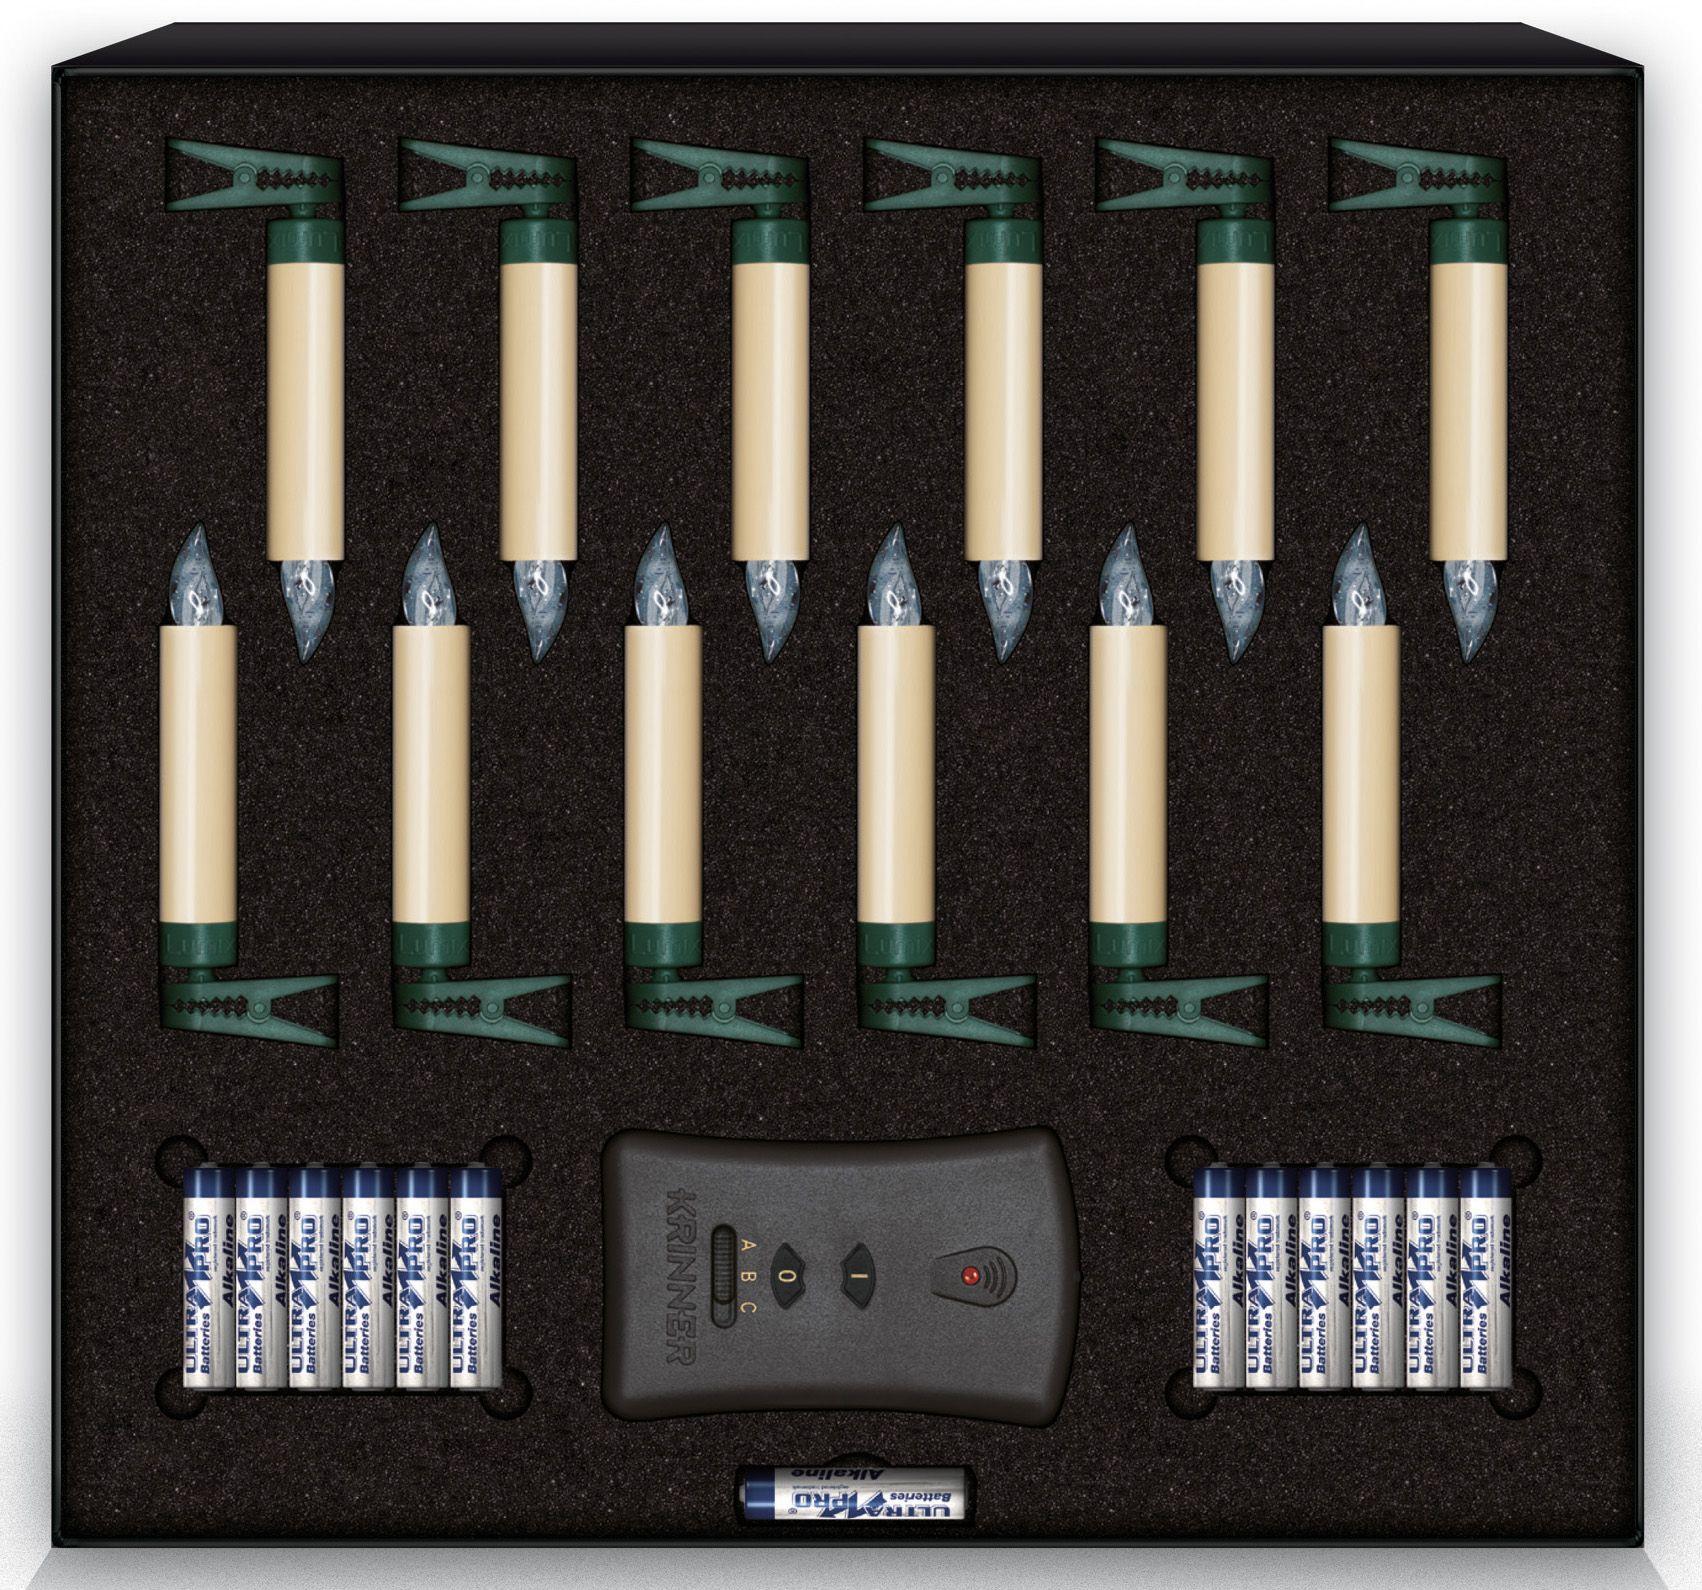 KRINNER Krinner LUMIX LED-Christbaumkerzen Basis-Set, 12 er, »Lumix Classic Mini«